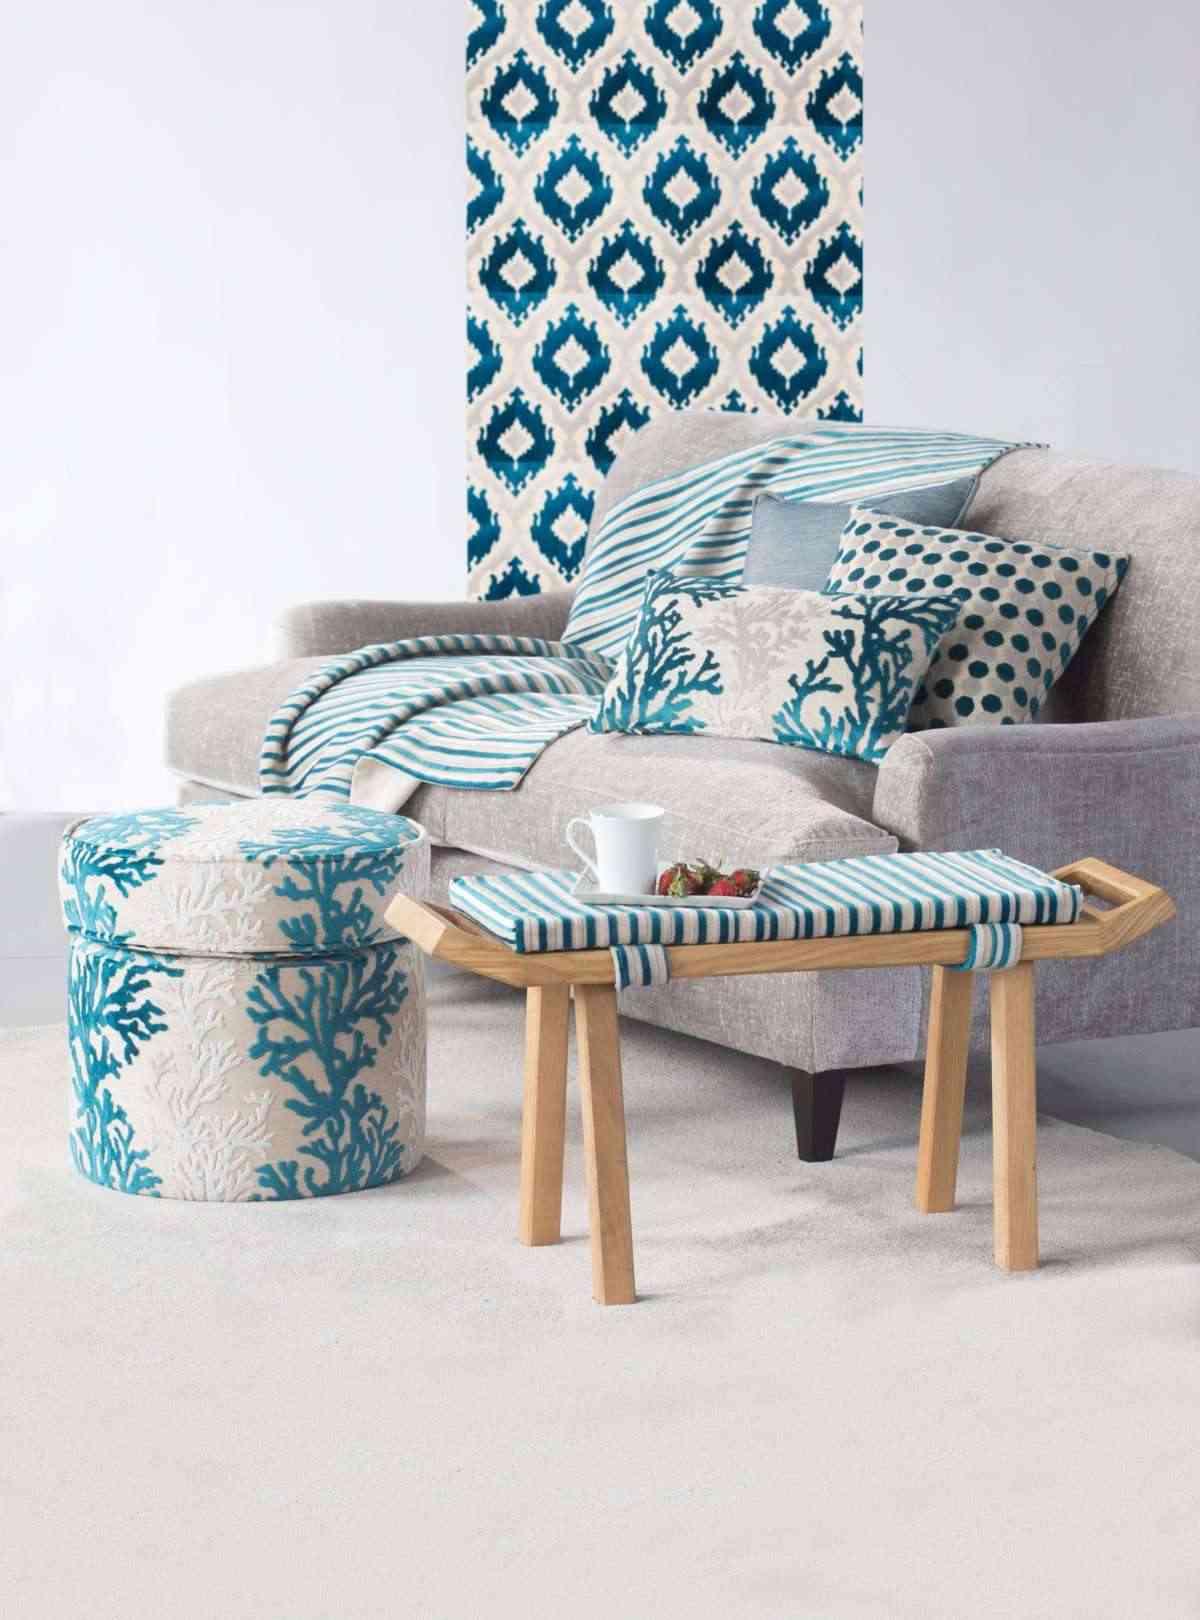 colecciones textiles - Soft London de Grancedo